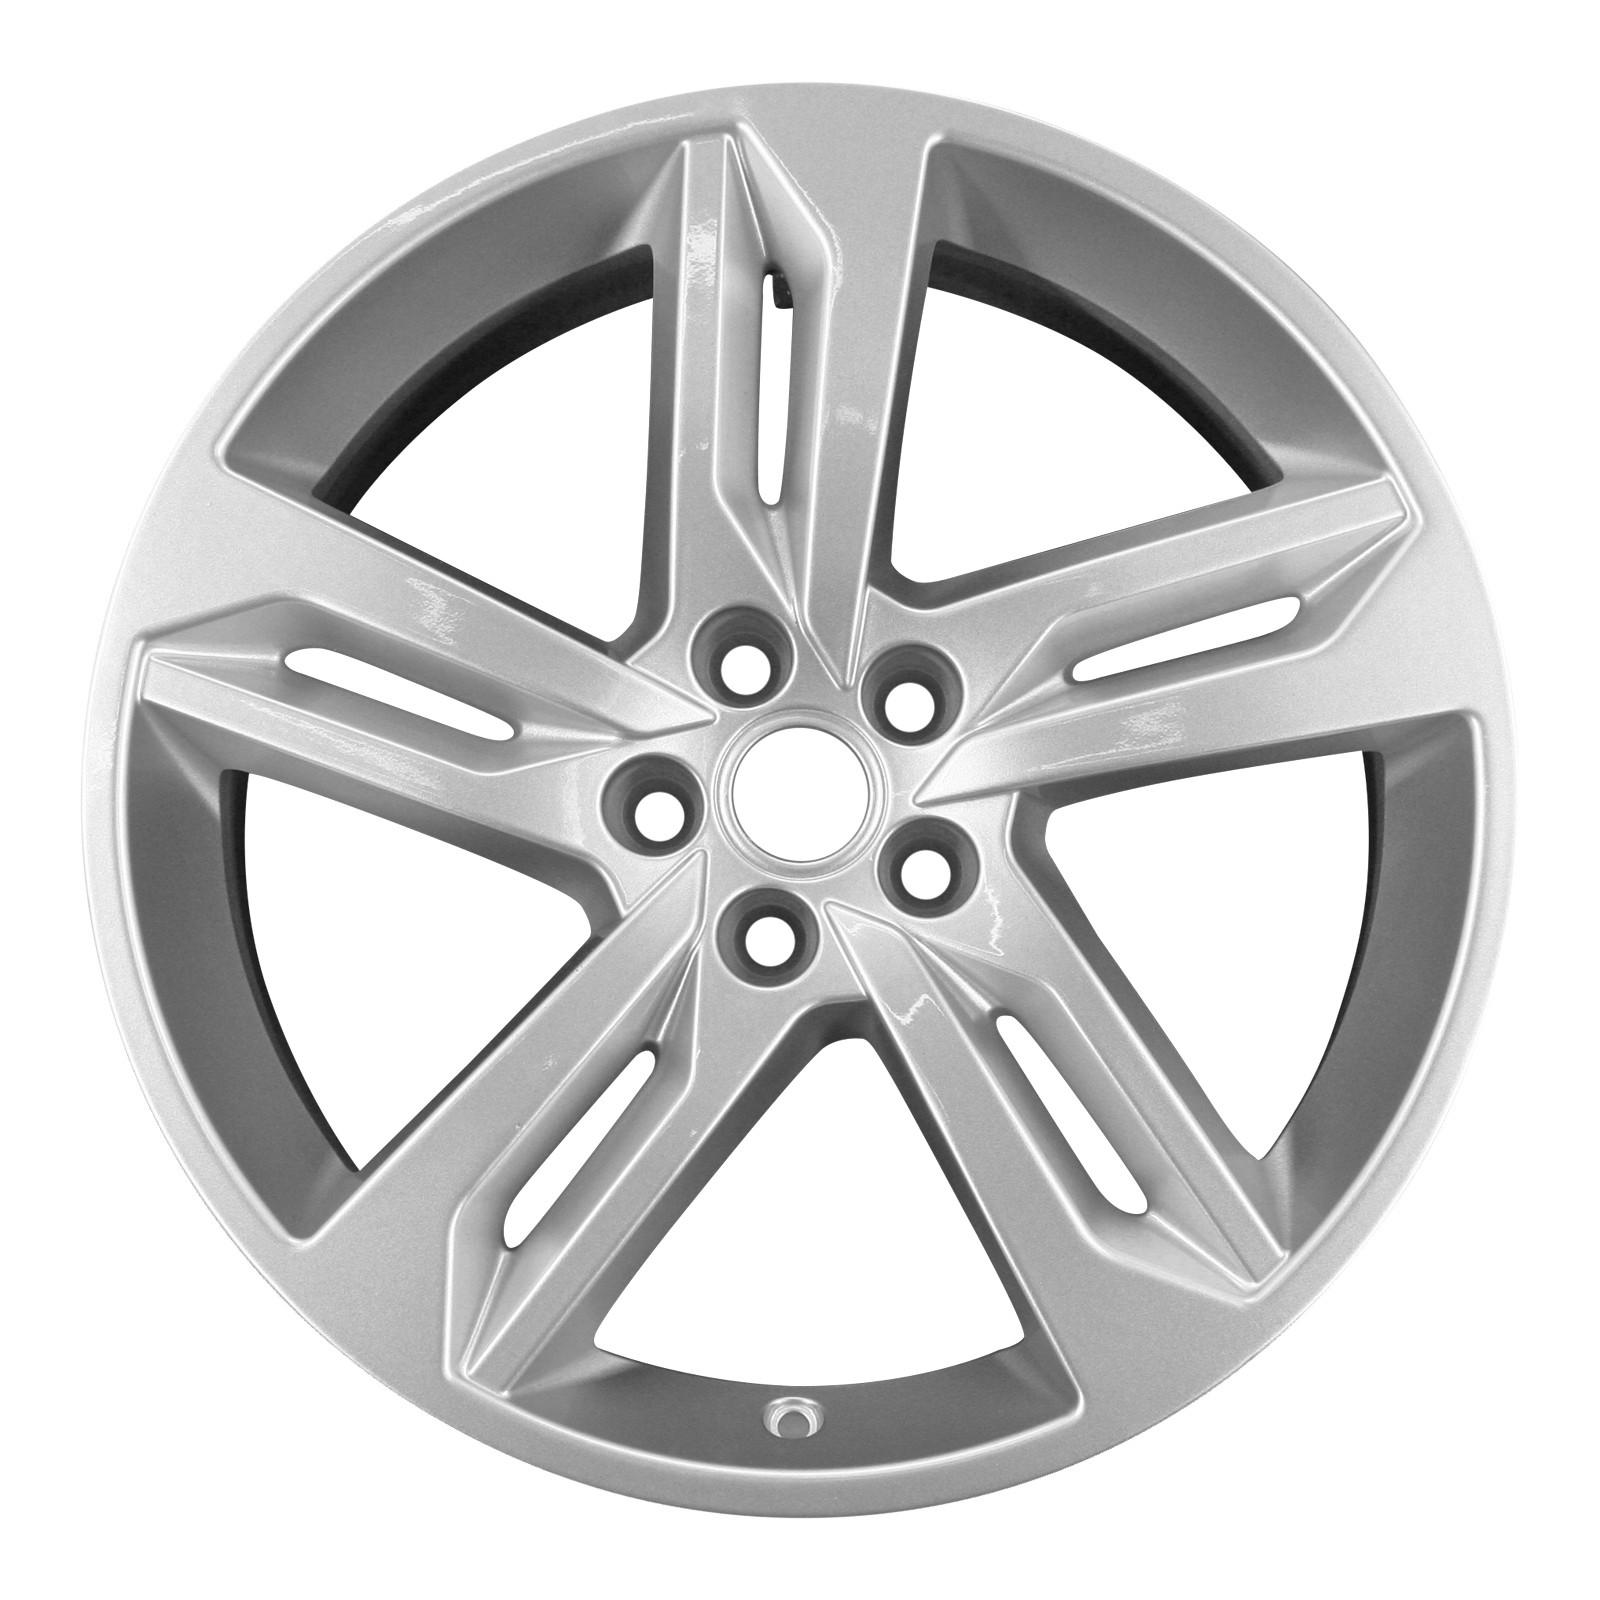 Колесный диск R19 Sparkle Silver для Range Rover Evoque